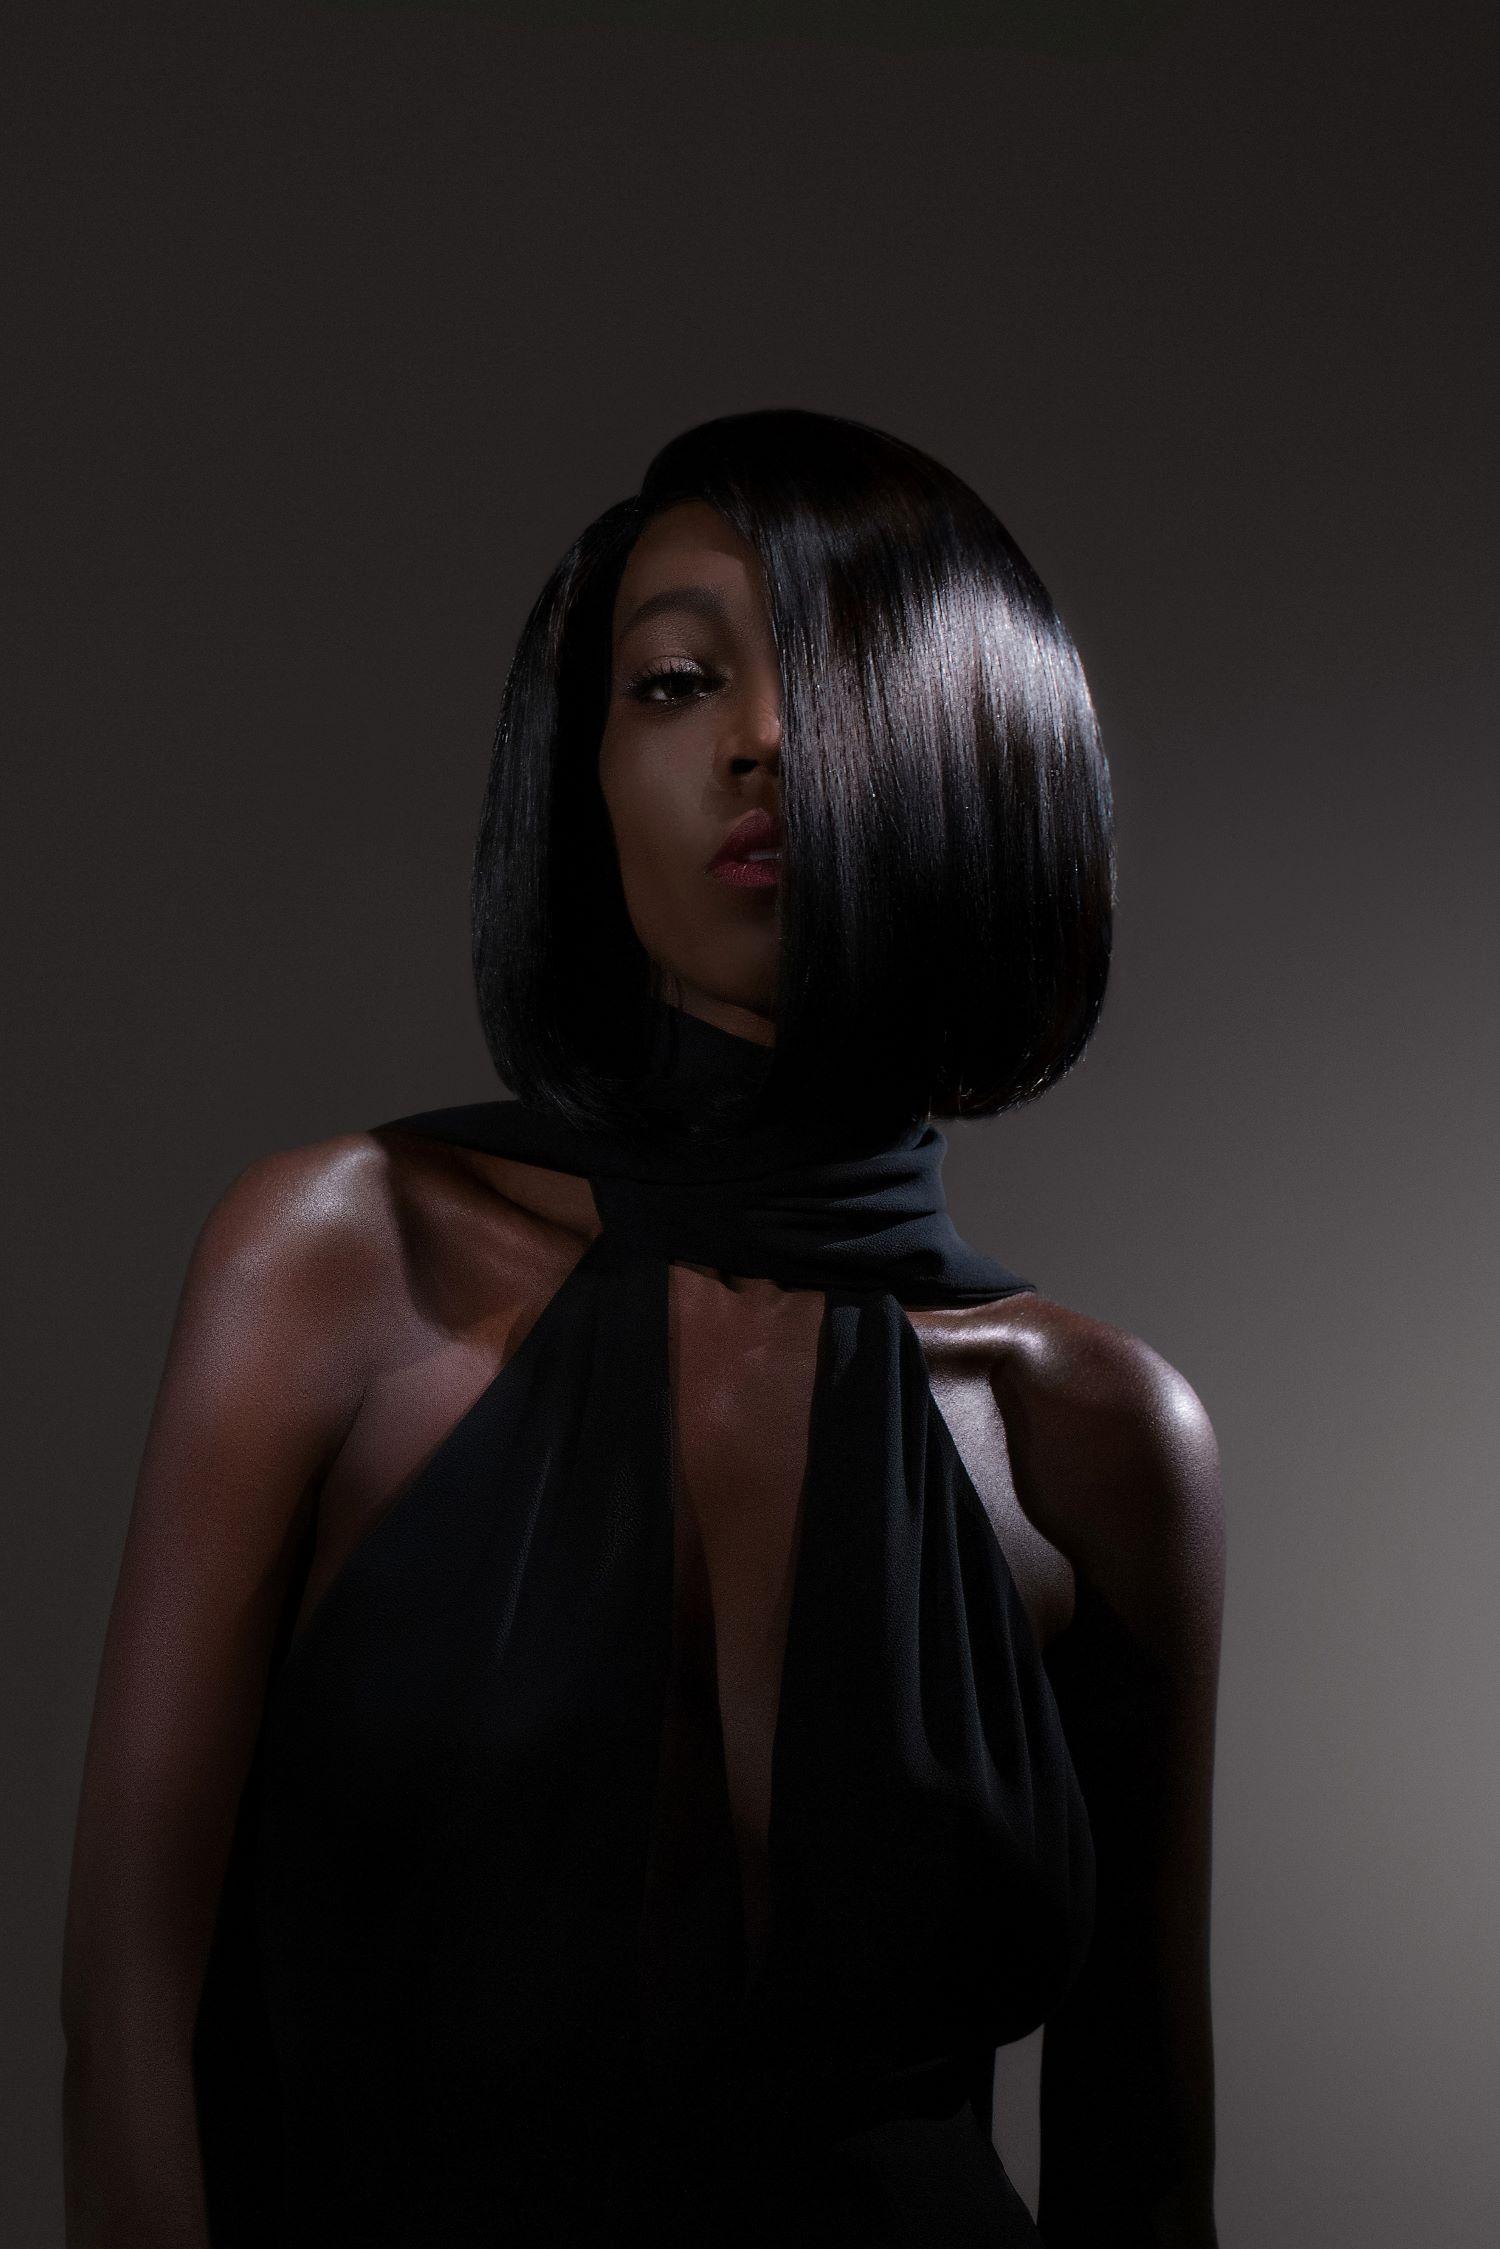 Beatnik Luxury Full Lace Black Wig- 360 Frontal Lace 8